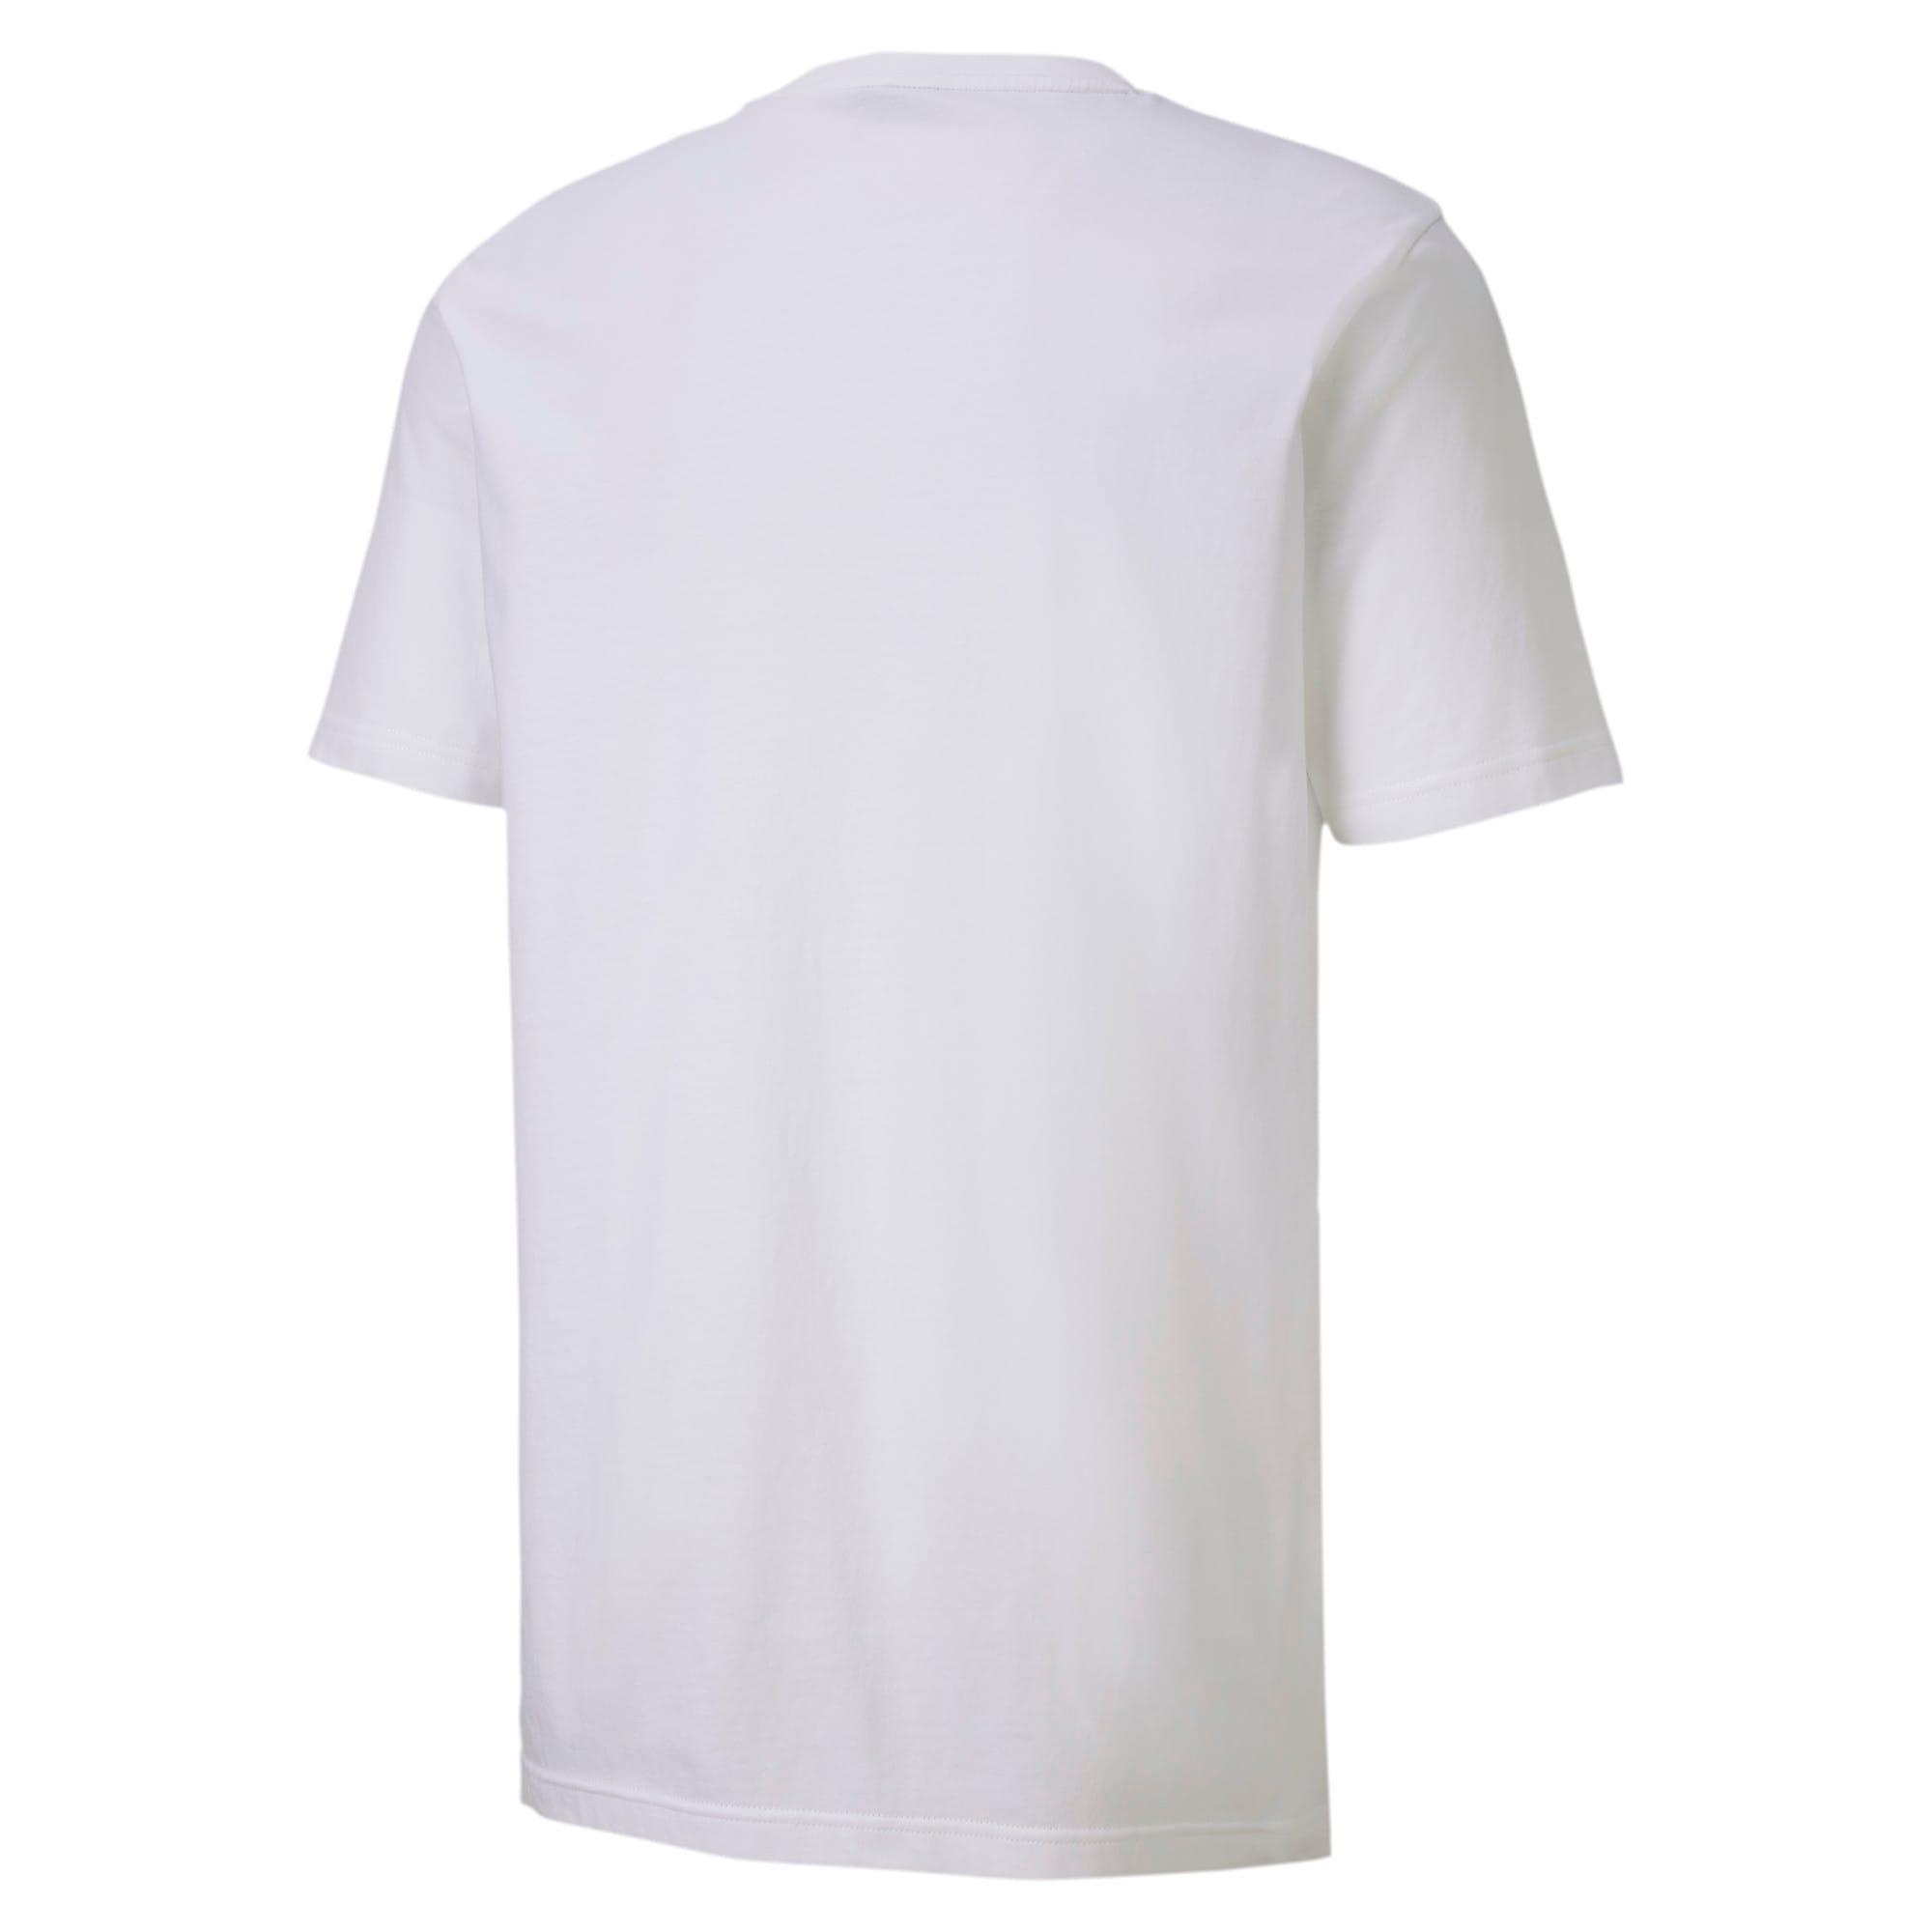 Thumbnail 6 of CLASSICS ロゴ SS Tシャツ 半袖, Puma White, medium-JPN